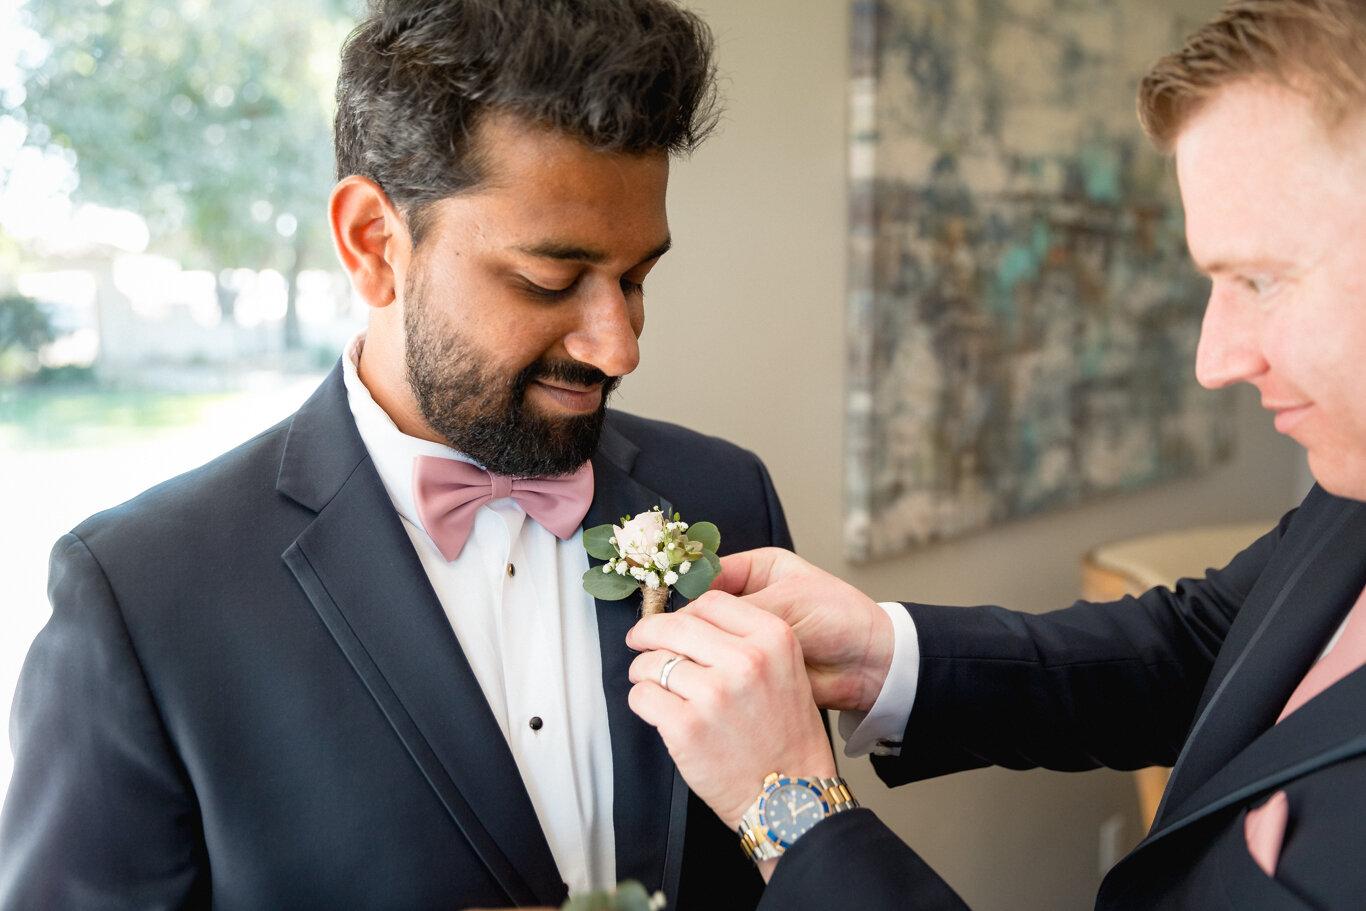 2019.08.24_Emily-Ashir-Wedding-at-the-Maples-5169.jpg